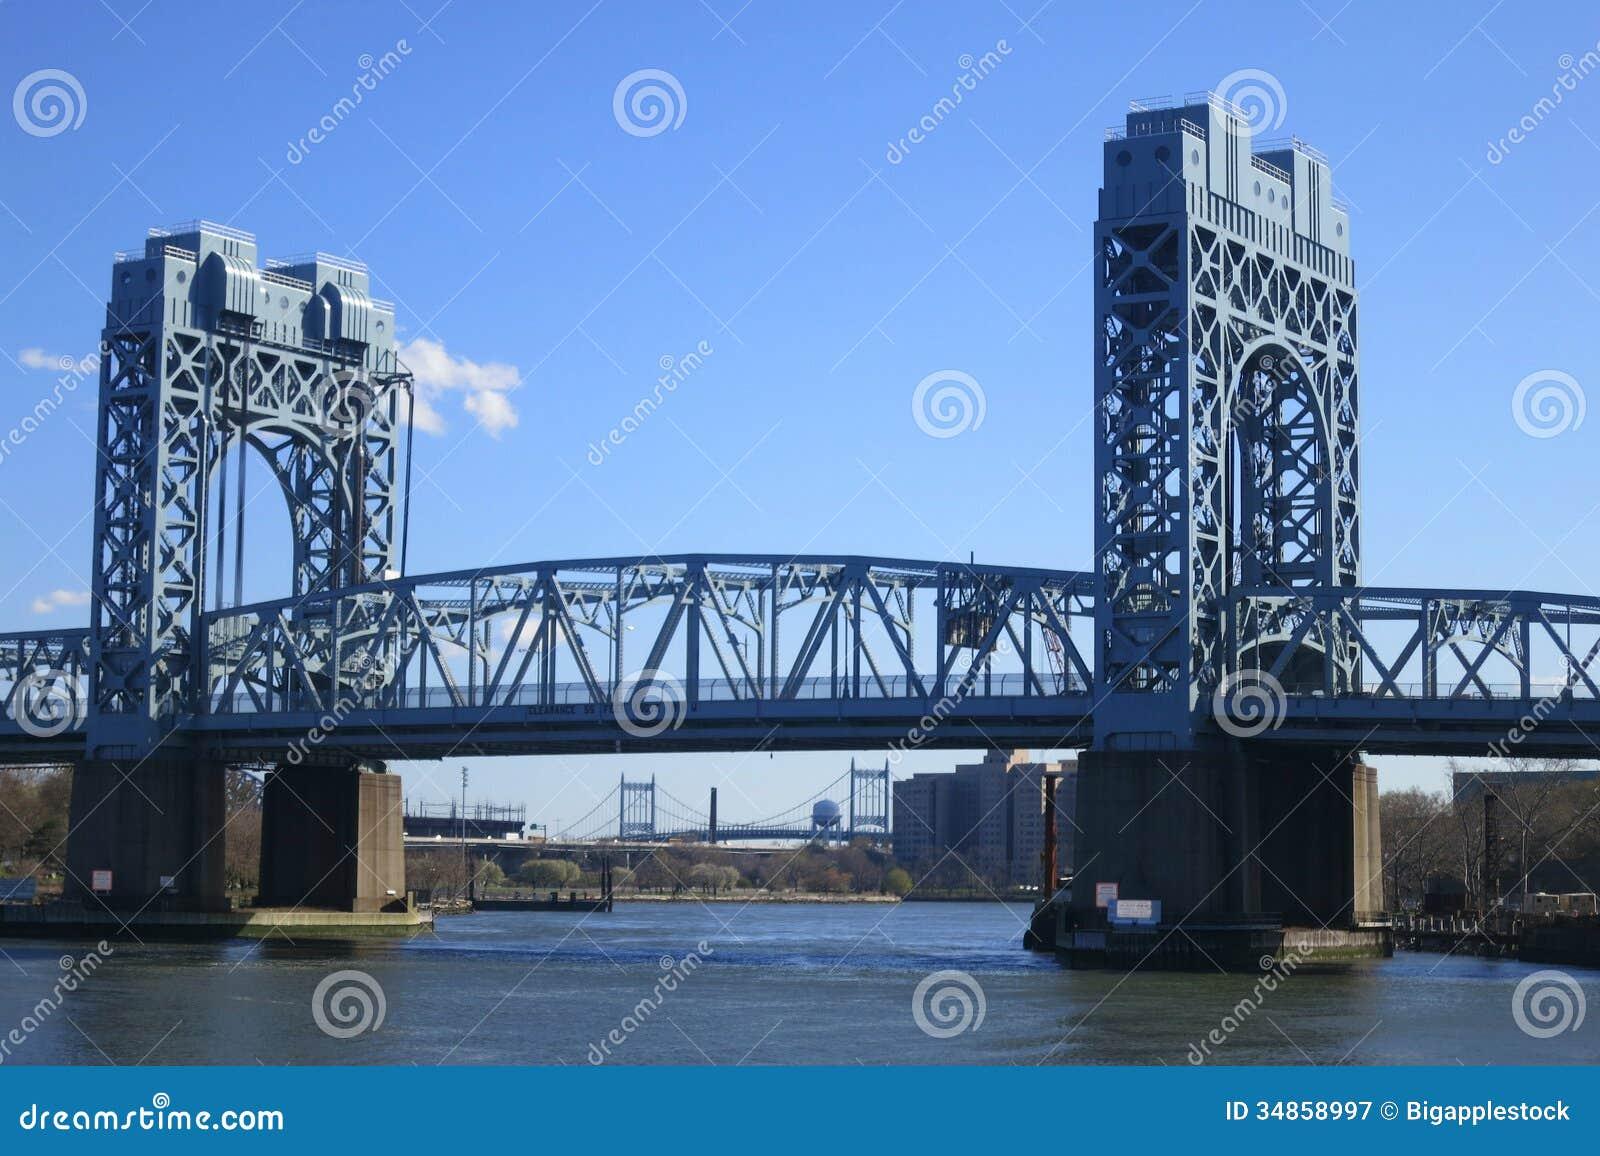 Robert F. Kennedy Bridge in New York City